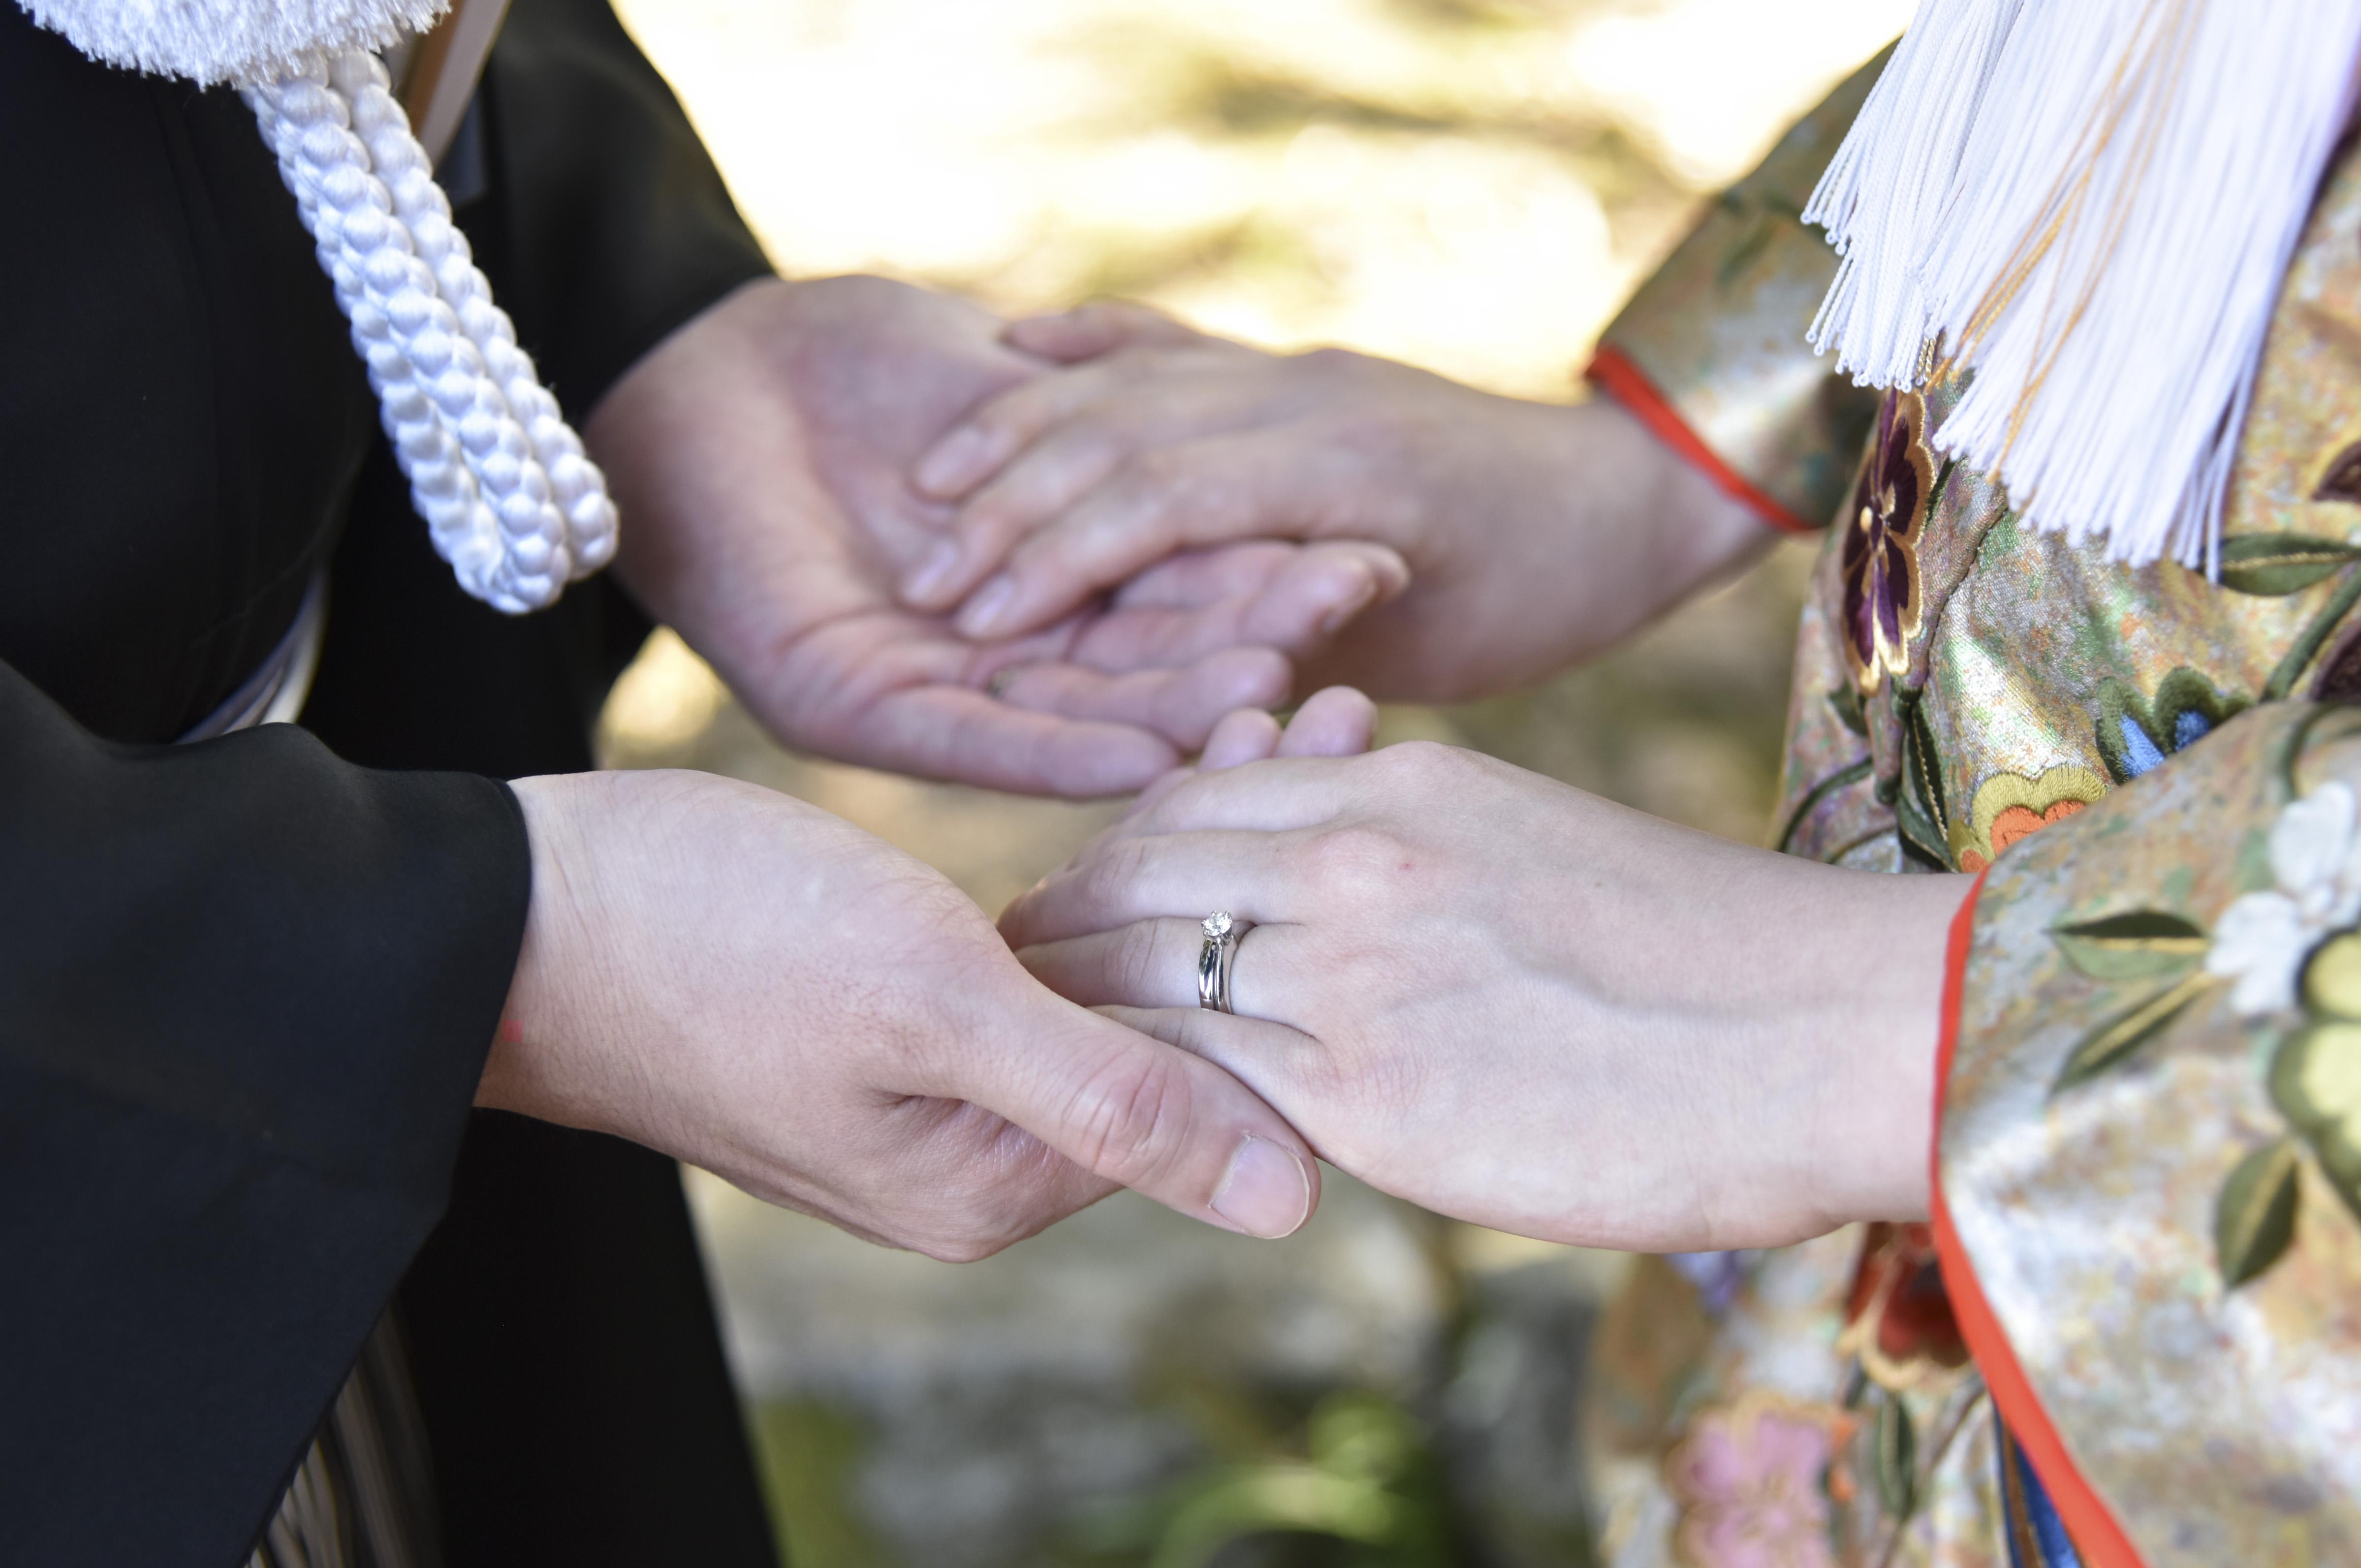 鹿児島で自宅結婚式